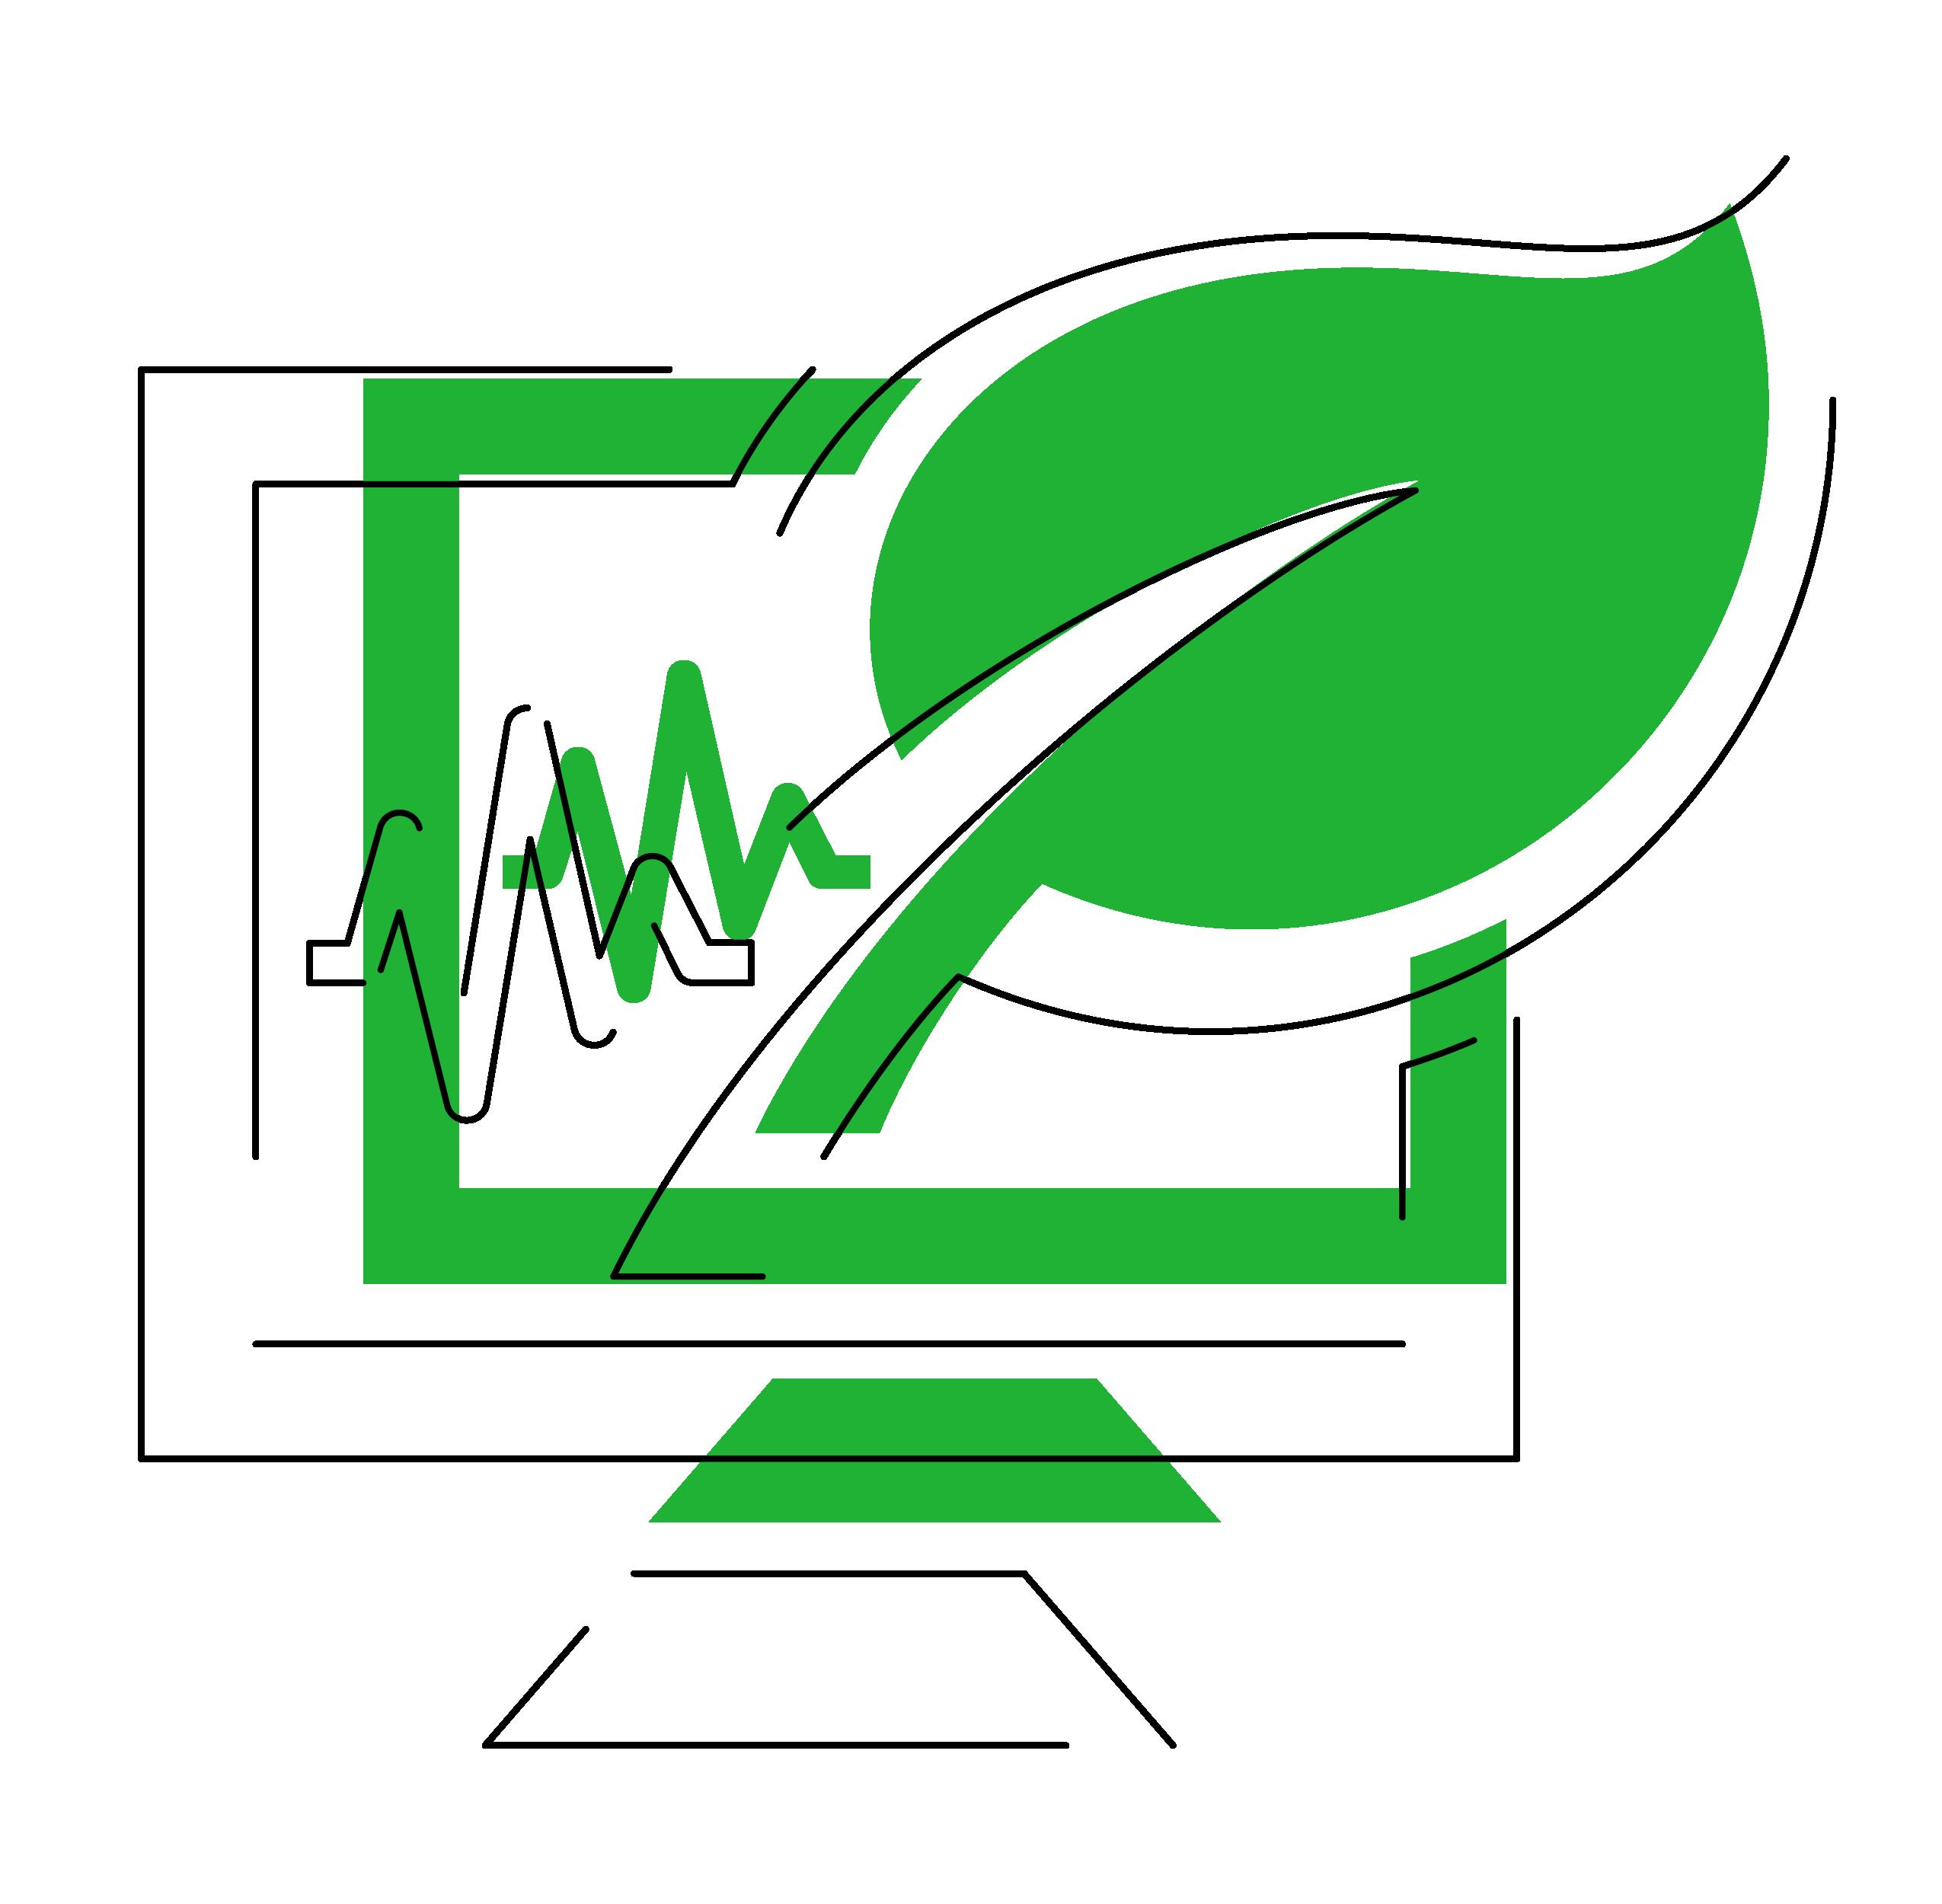 iMoSyS-Environmental-Monitoring